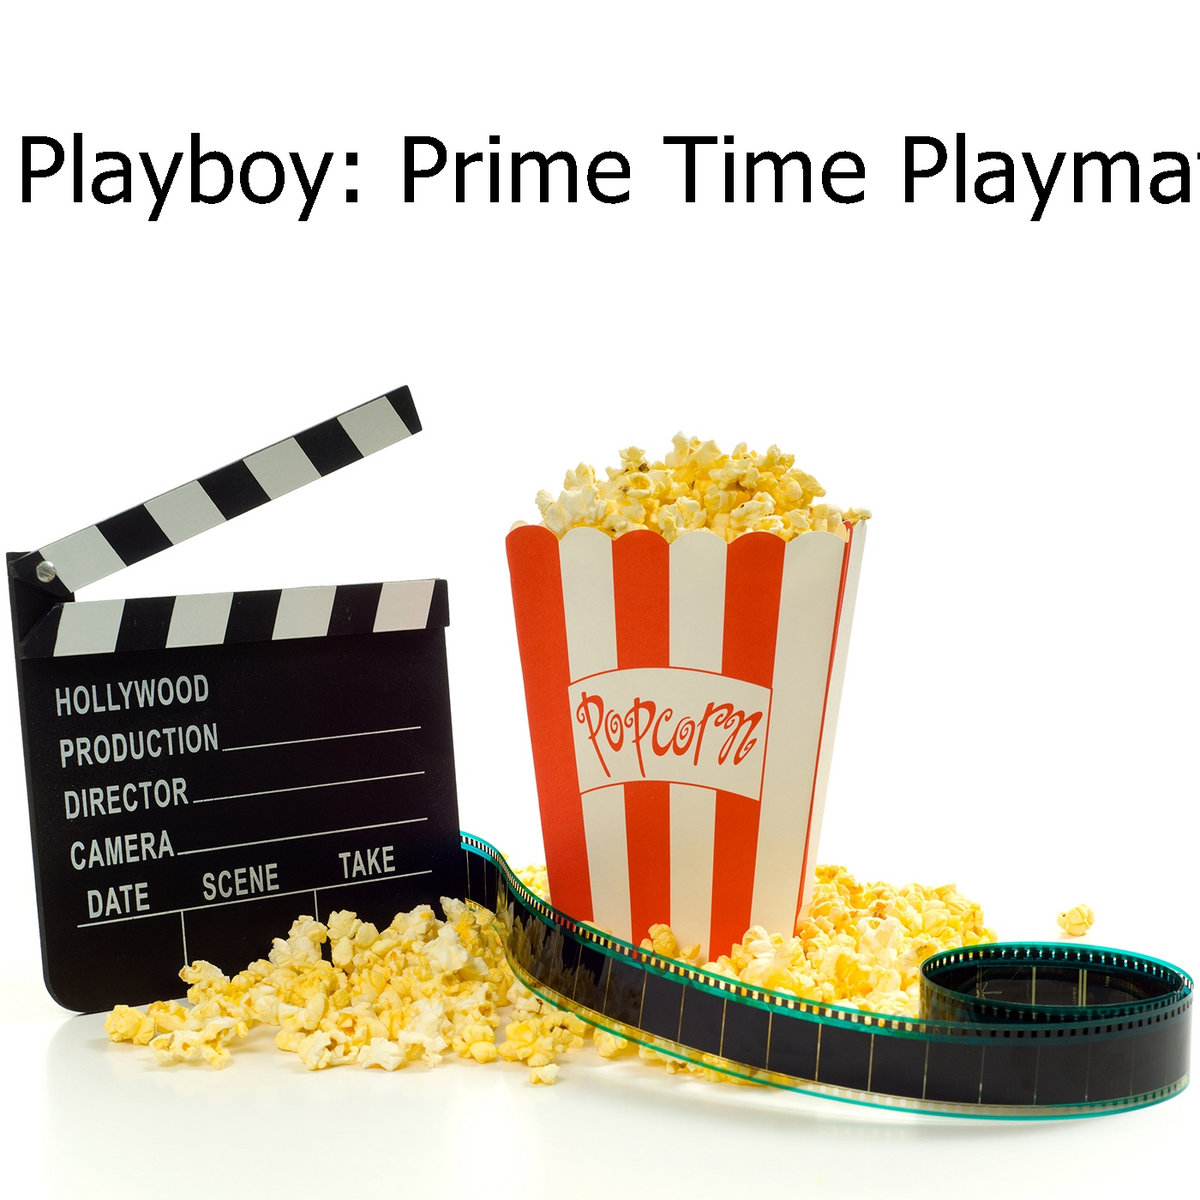 Playboy online dating POF framgångs historier dating